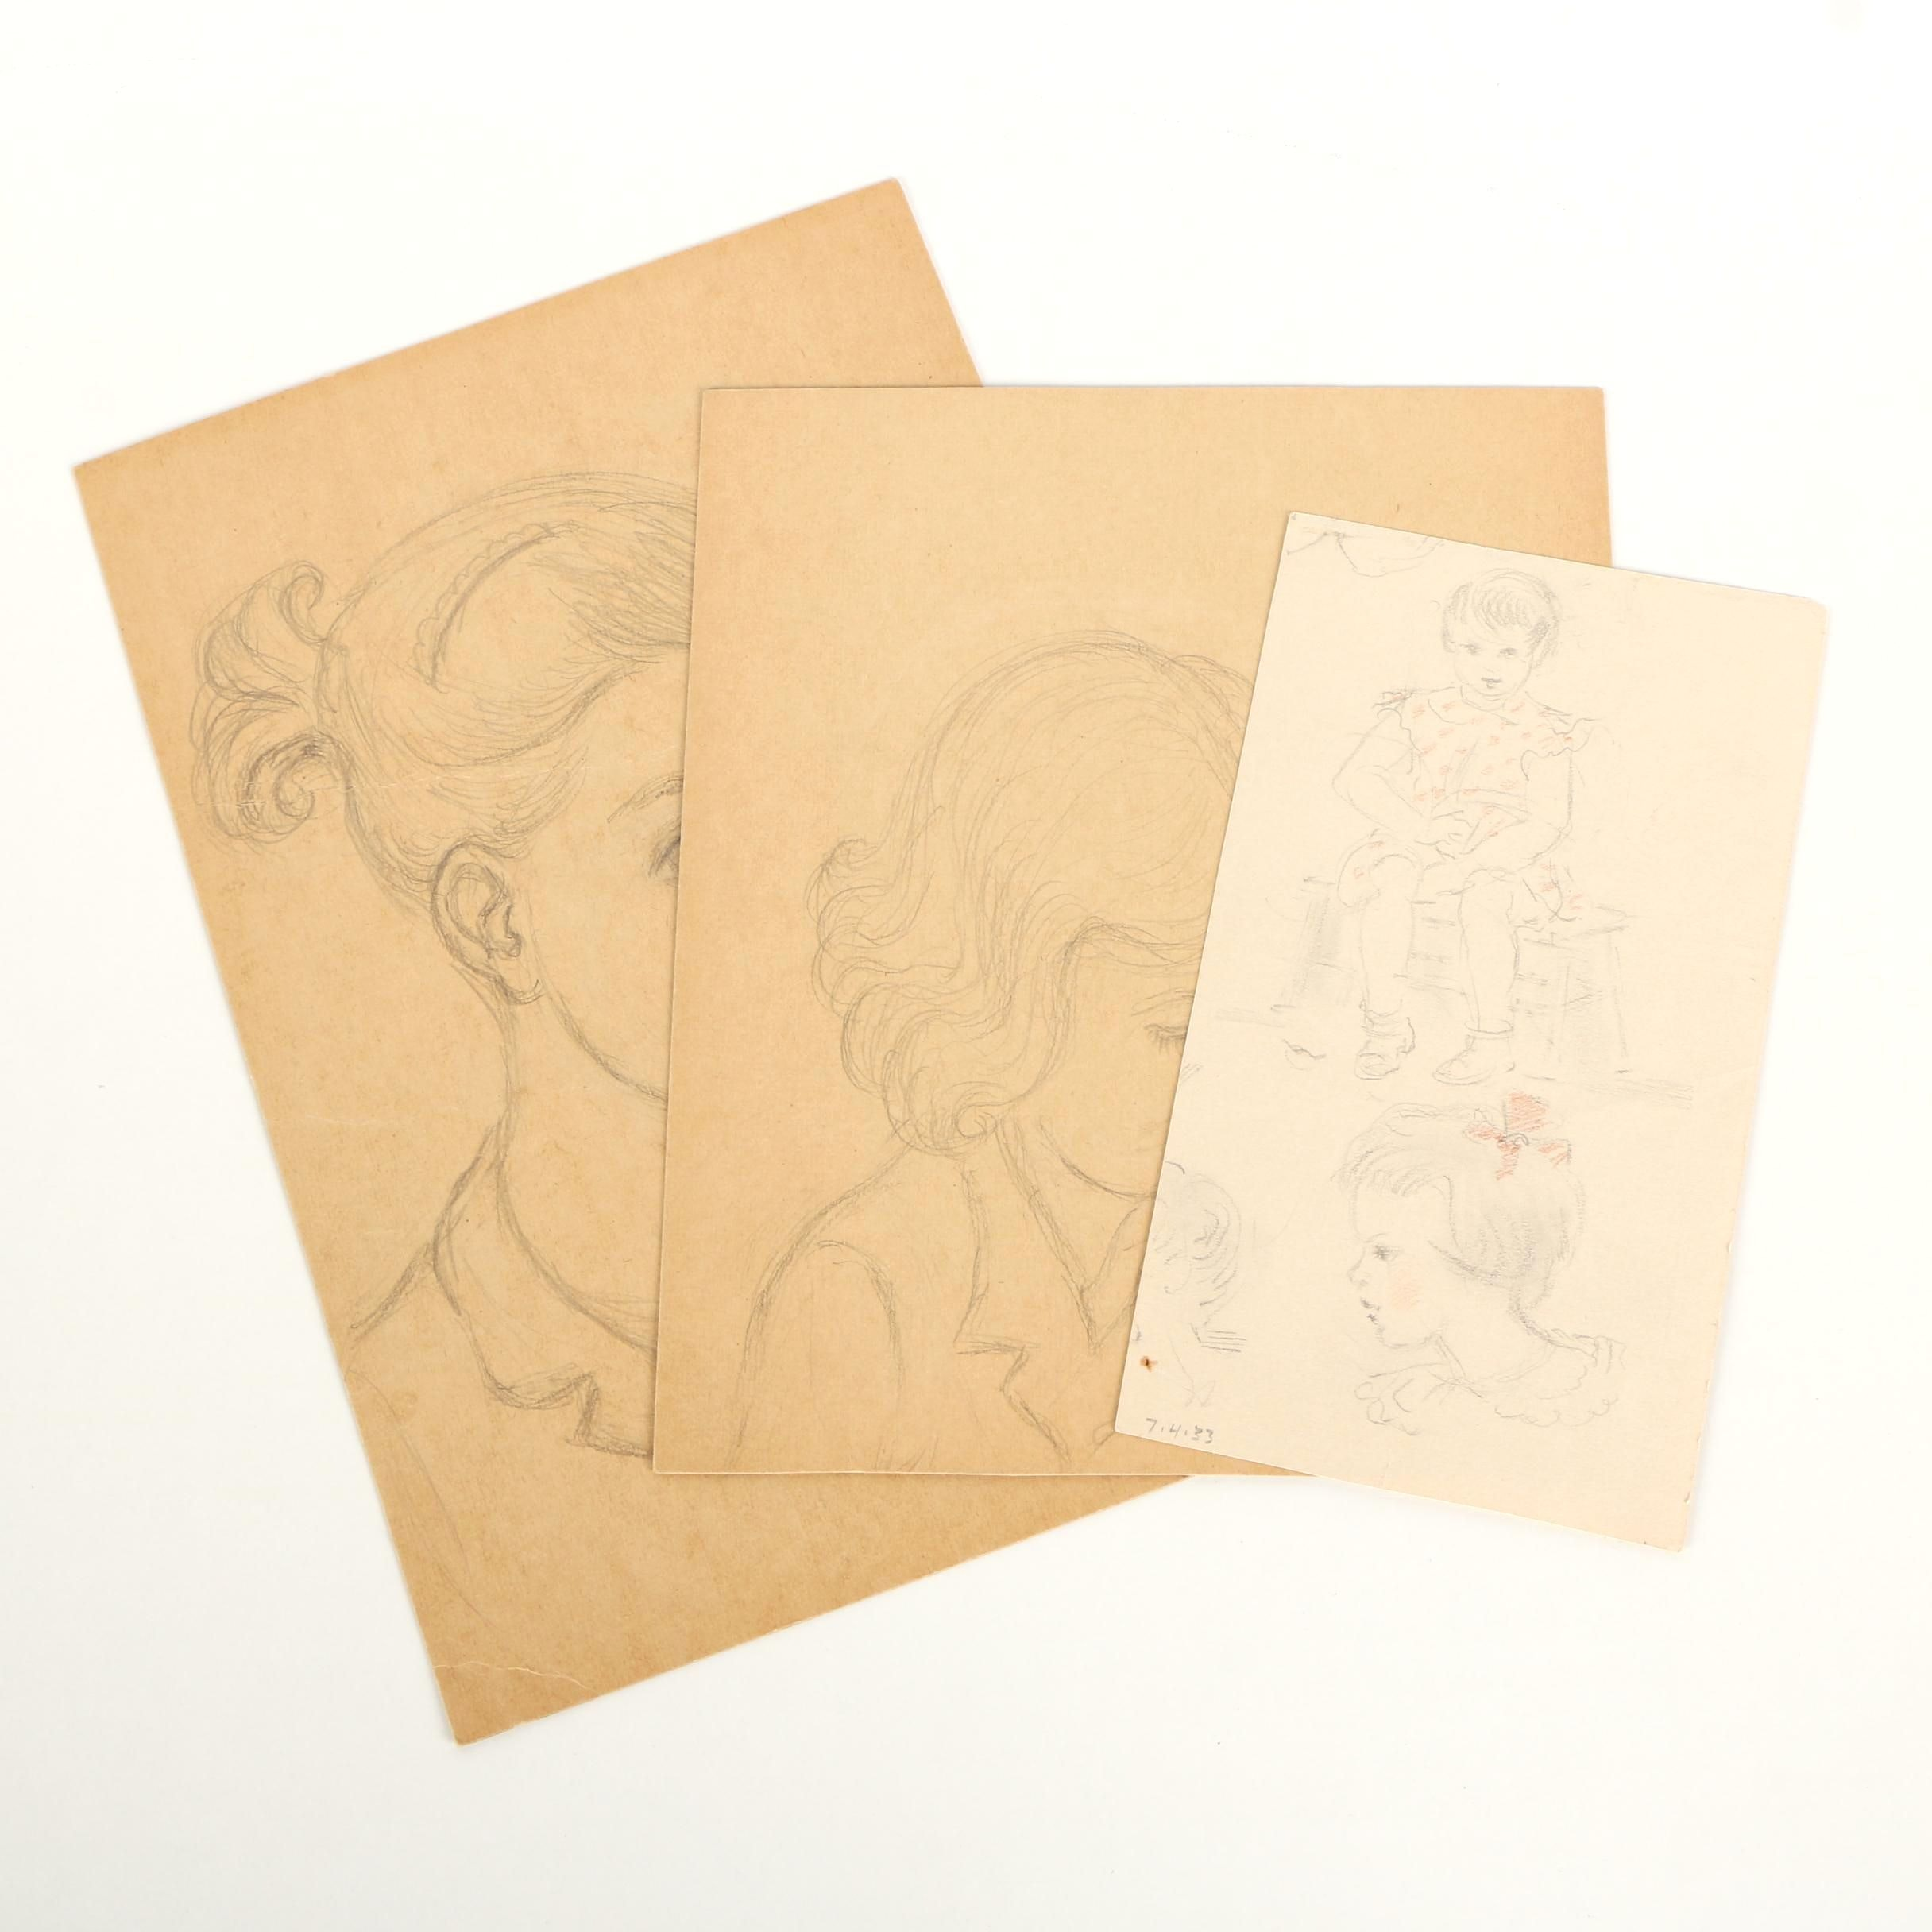 Stanley Bielecky Graphite Drawings